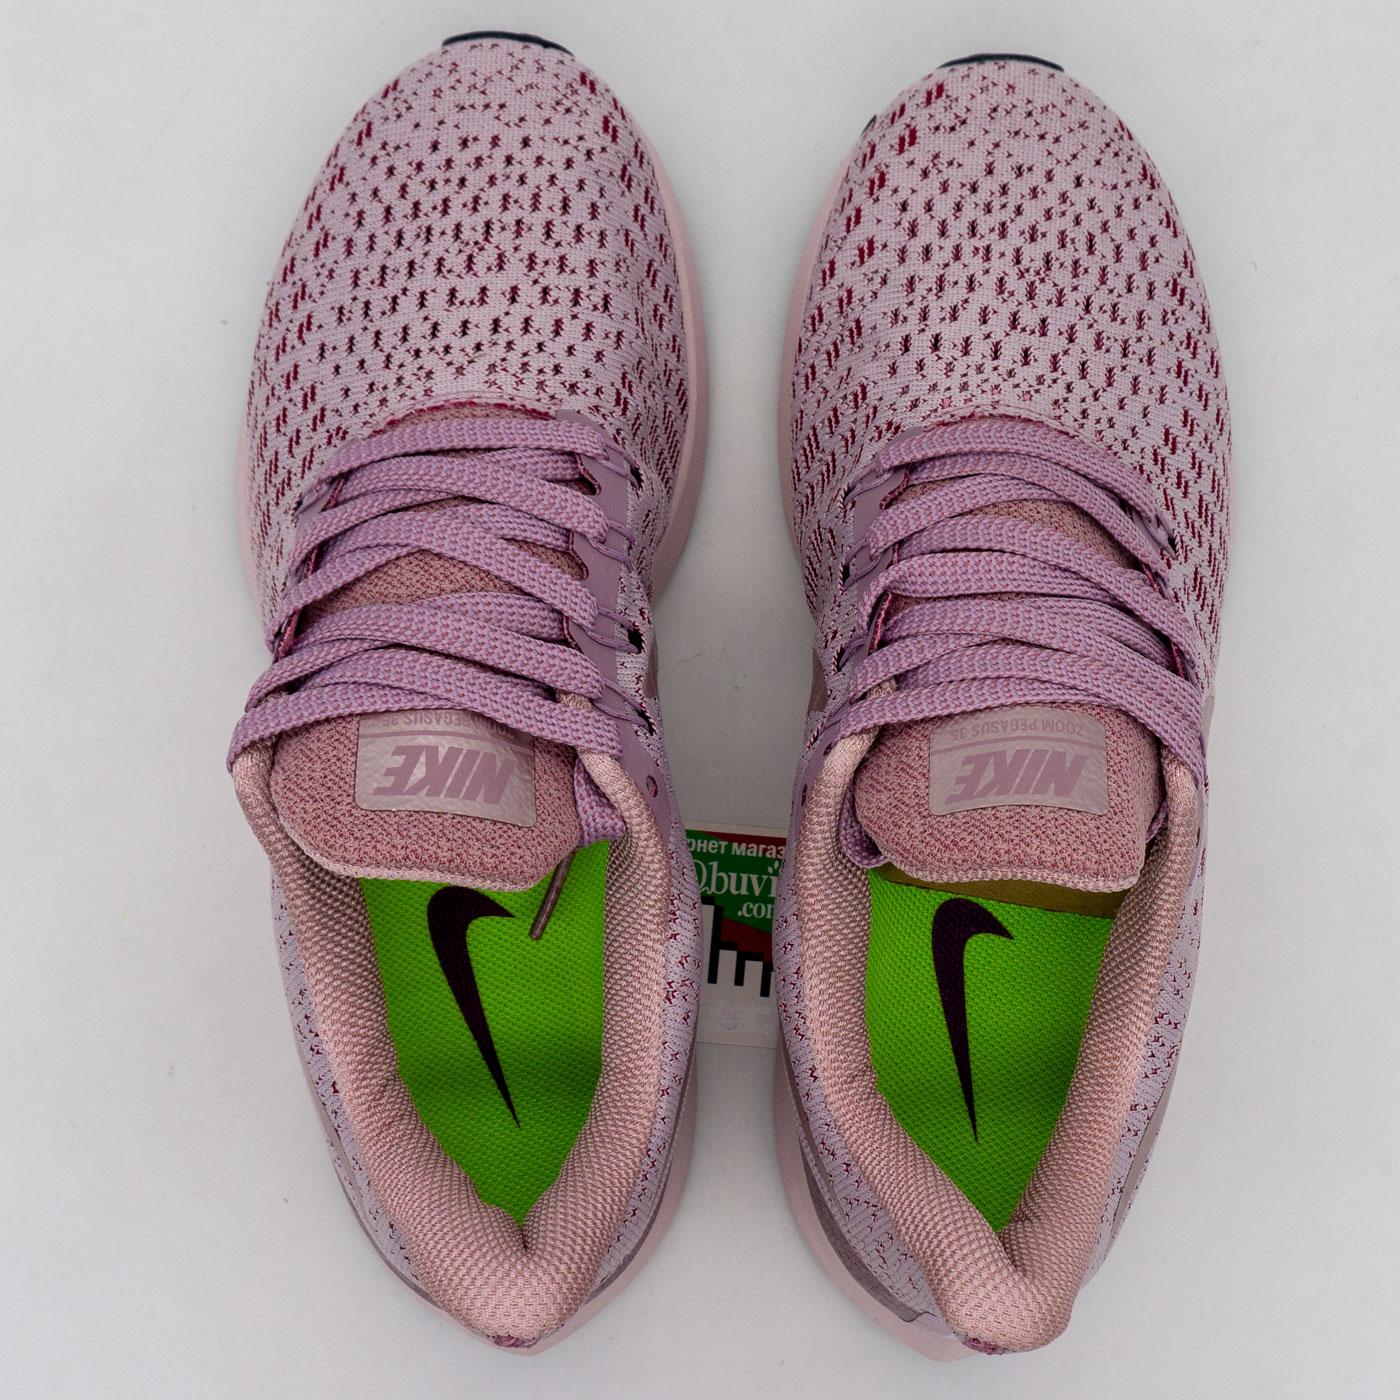 фото back Женские кроссовки для бега Nike Zoom Pegasus 35 серебро с розовым. Топ качество! back